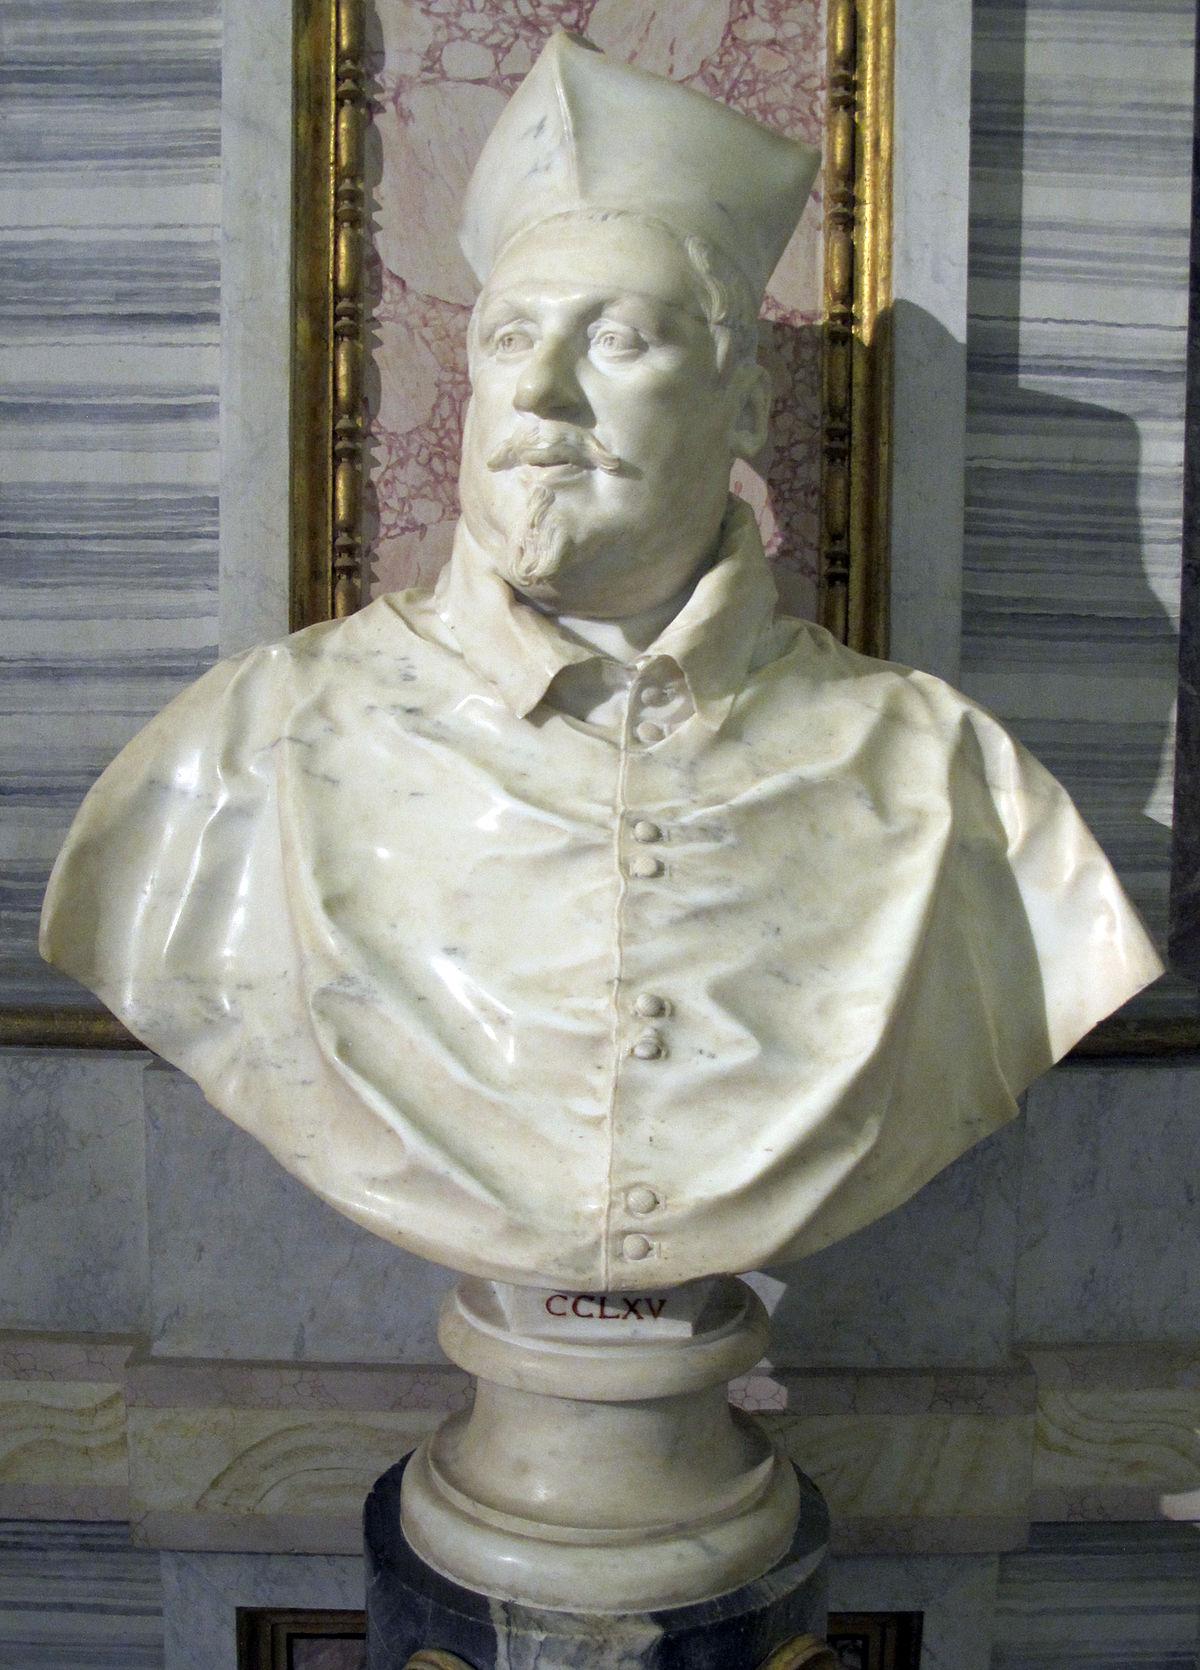 aab7d225b Busti di Scipione Borghese - Wikipedia